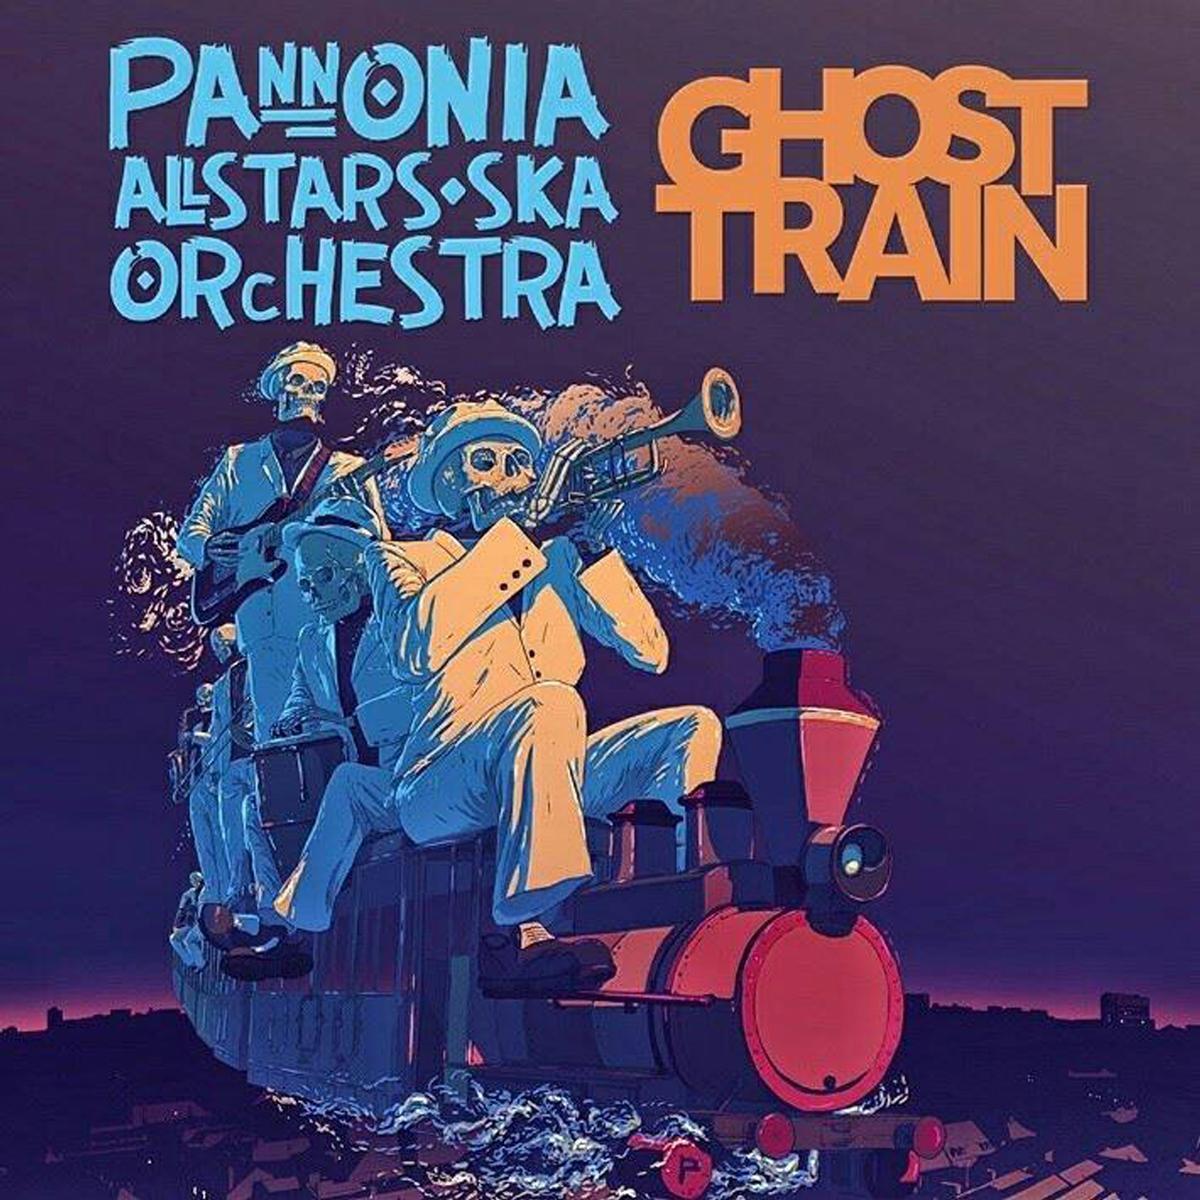 Pannonia Allstars Ska Orchestra - Ghost Town